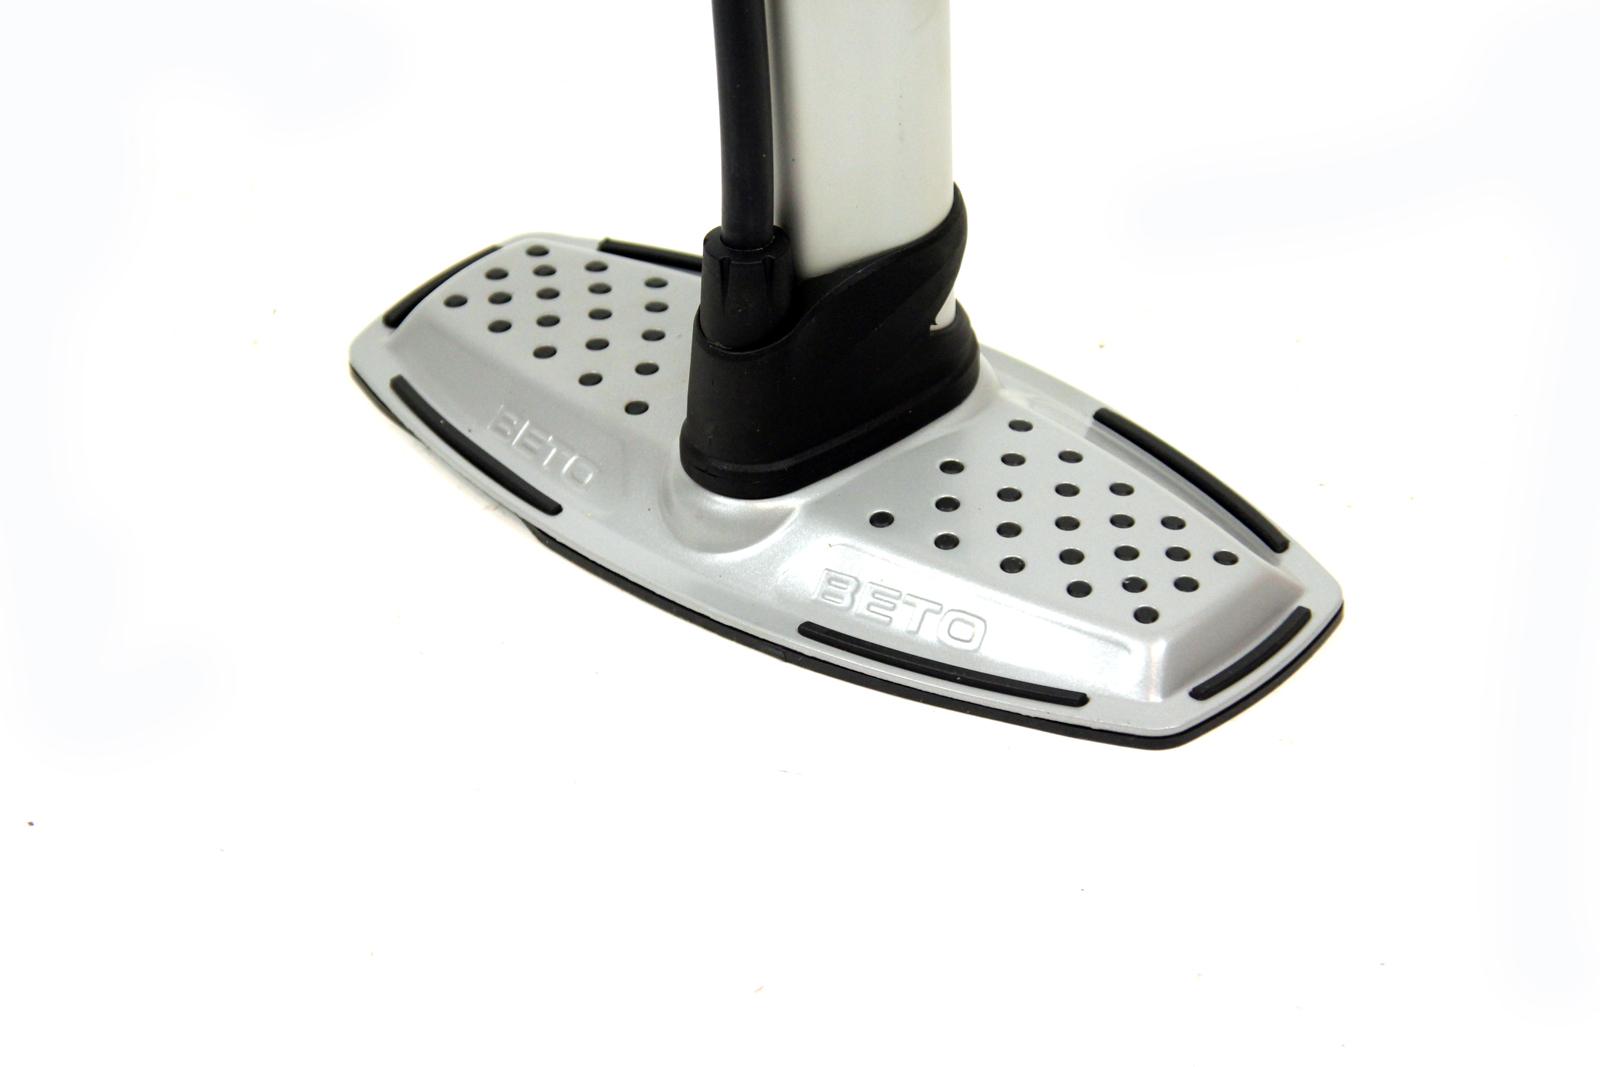 beto standkompressor bis 11 bar 160 psi fahrrad standpumpe. Black Bedroom Furniture Sets. Home Design Ideas